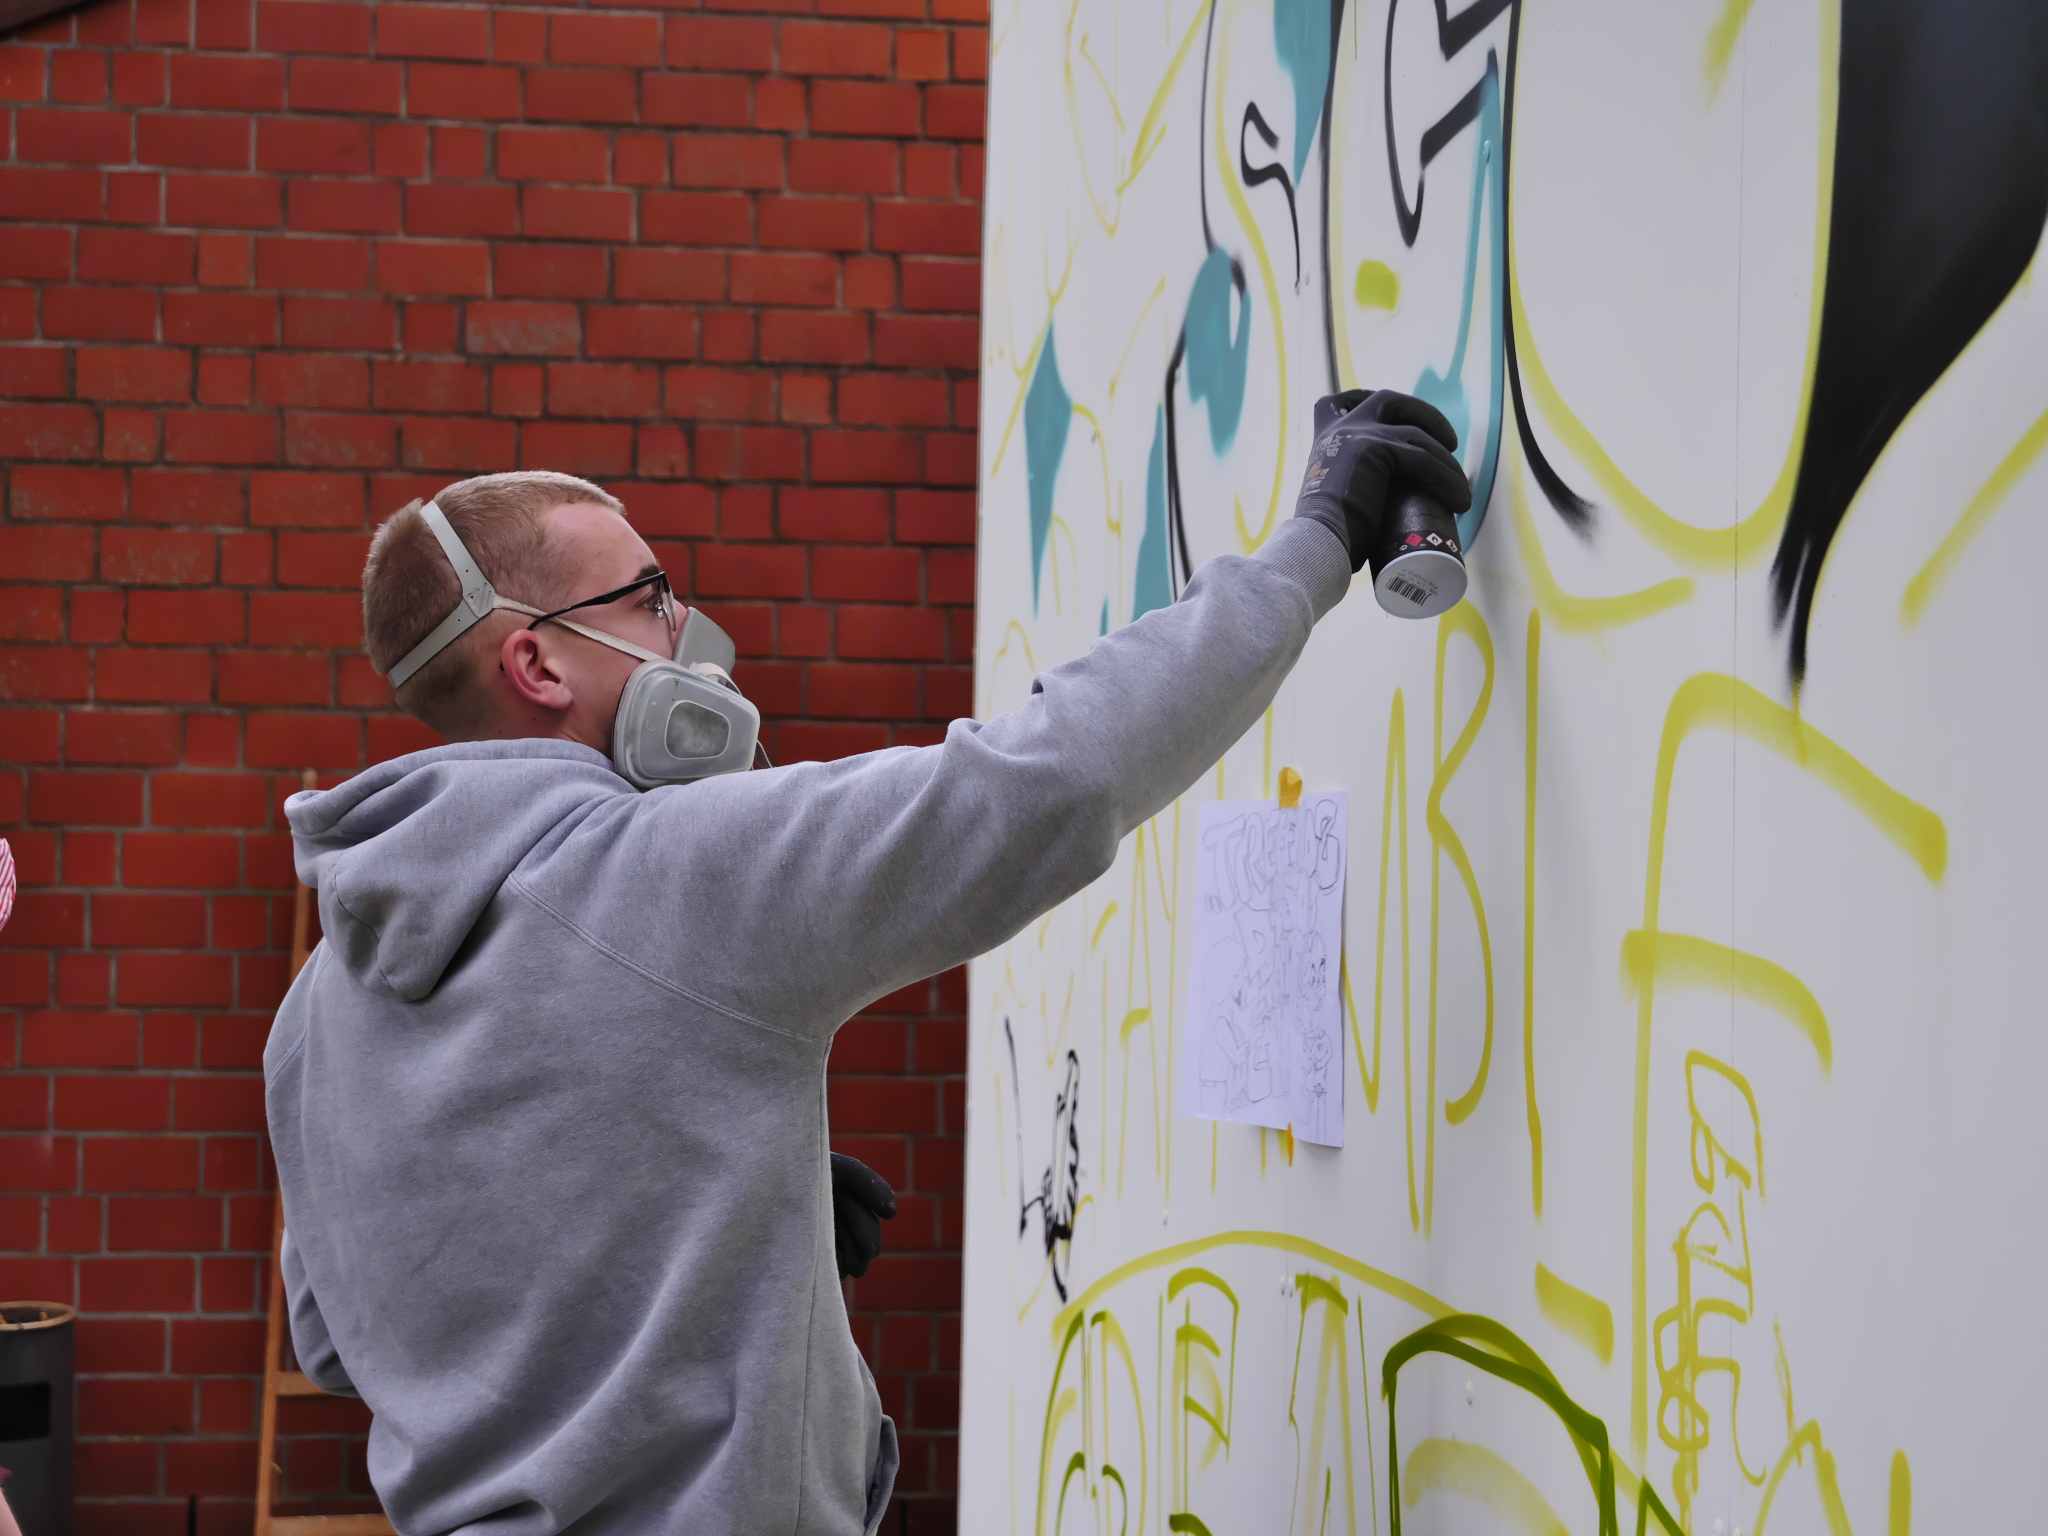 jugendkulturjahr-2020-ratingen-jkj2020-Graffitiworksjop-Bild11